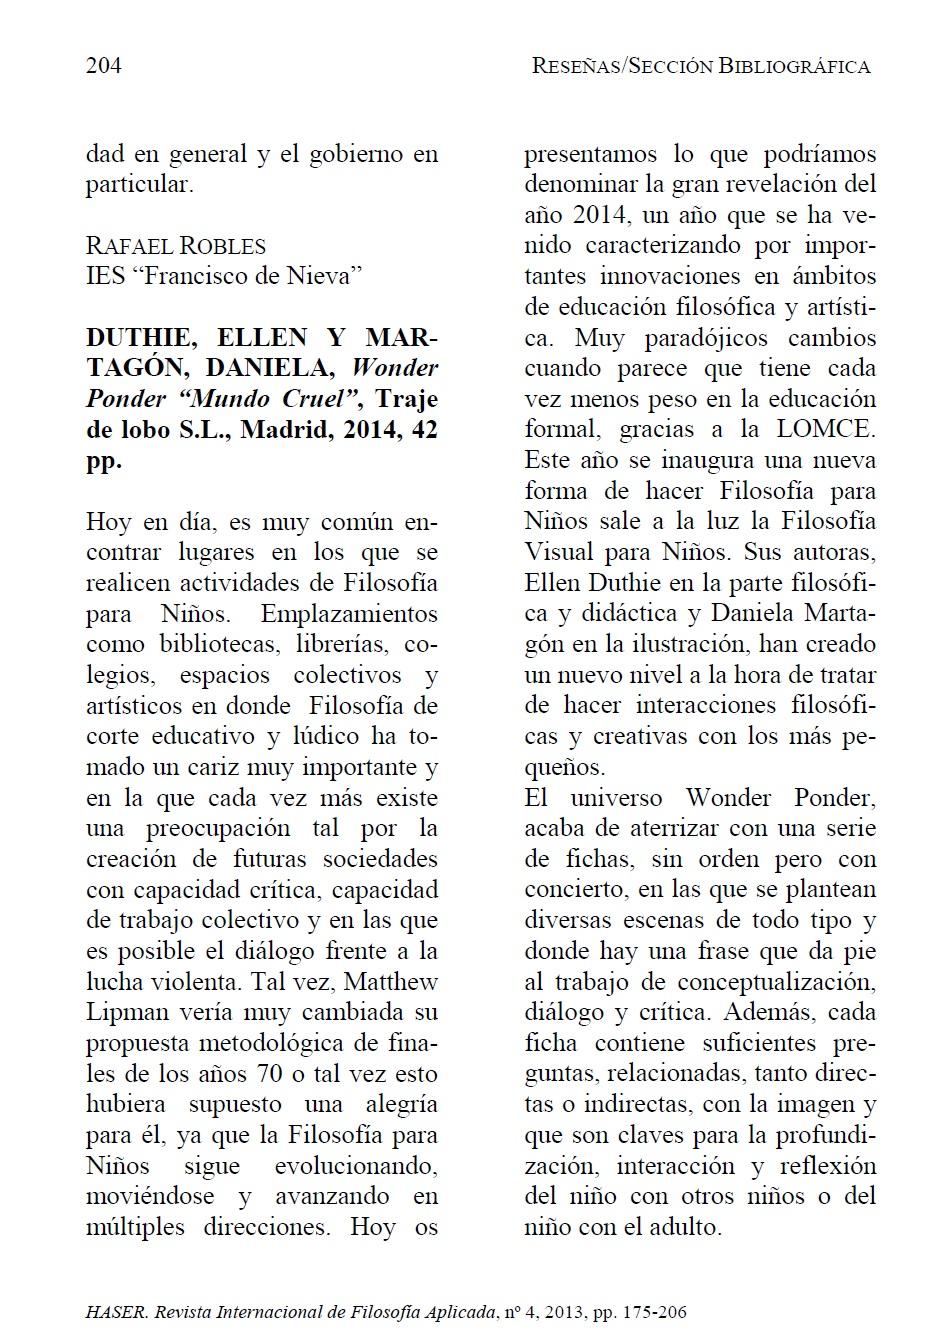 HASER, reseña Mundo cruel, pág. 1